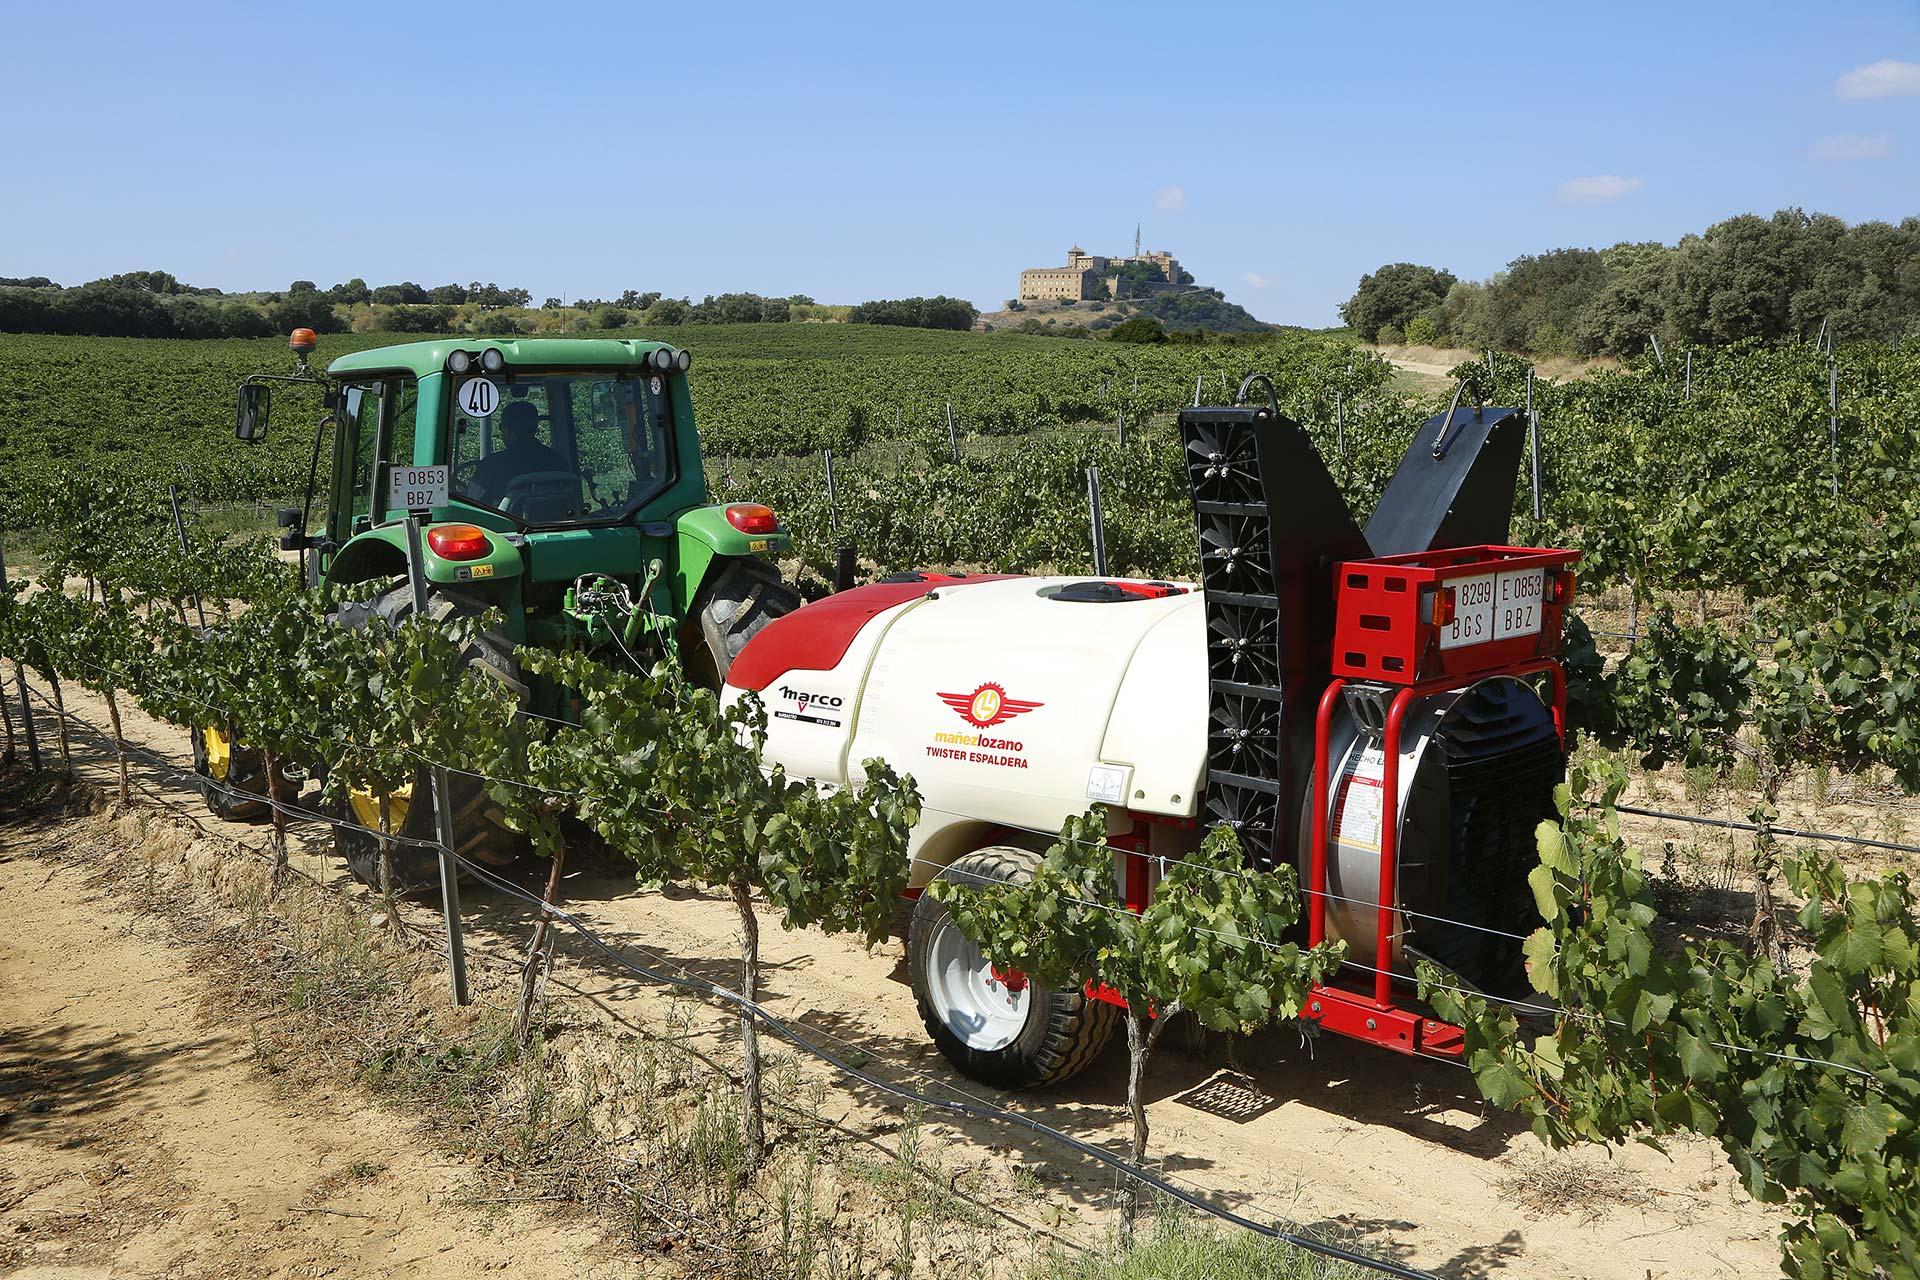 comprar-maquinaria-agricola-huesca-marco-8_c35e33684efab5dafdd76c21e999f9f9